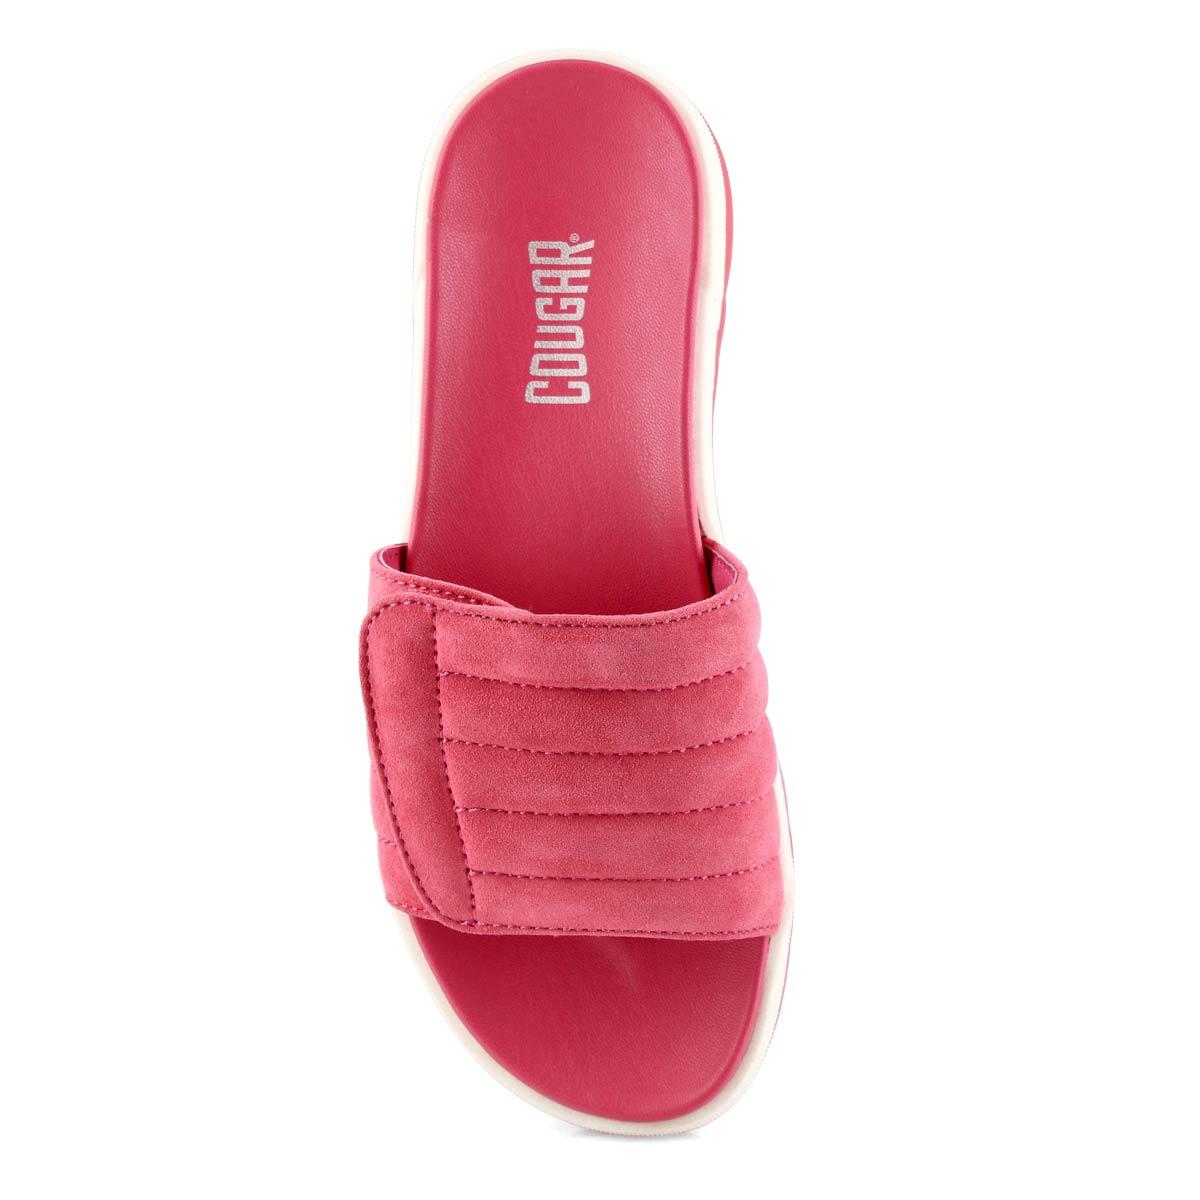 Women's LUPIN rose slide sandals